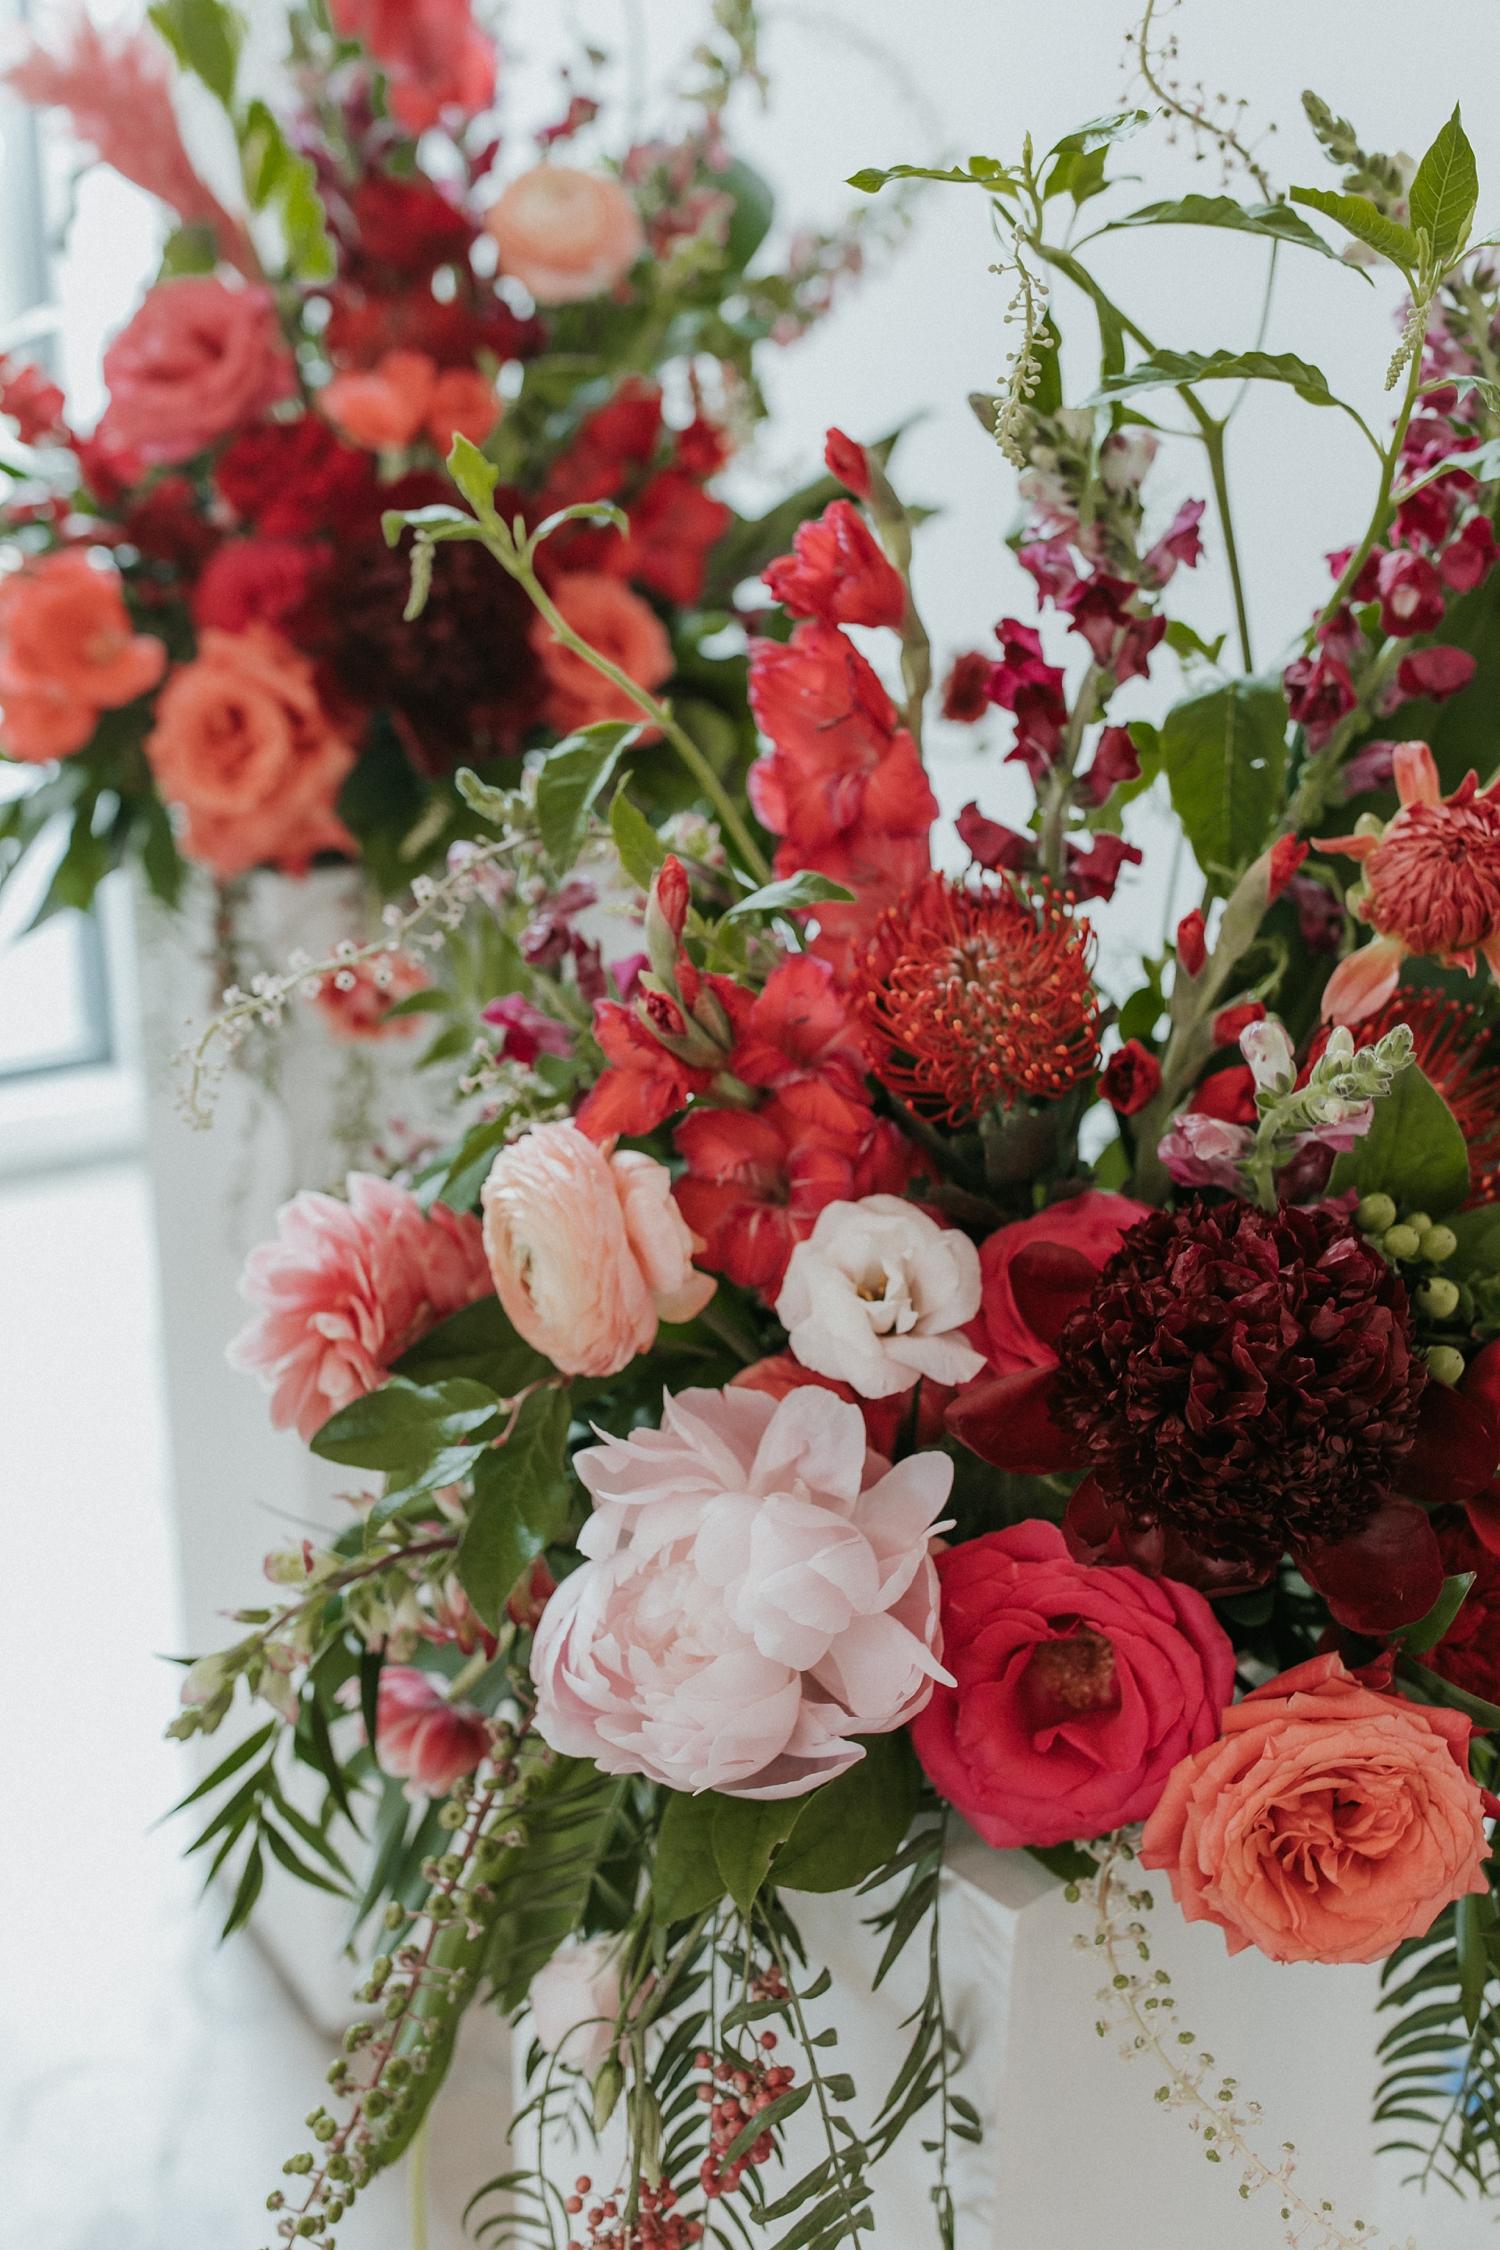 Alicia+lucia+photography+-+albuquerque+wedding+photographer+-+santa+fe+wedding+photography+-+new+mexico+wedding+photographer+-+wedding+flowers+-+summer+wedding+flowers_0047.jpg